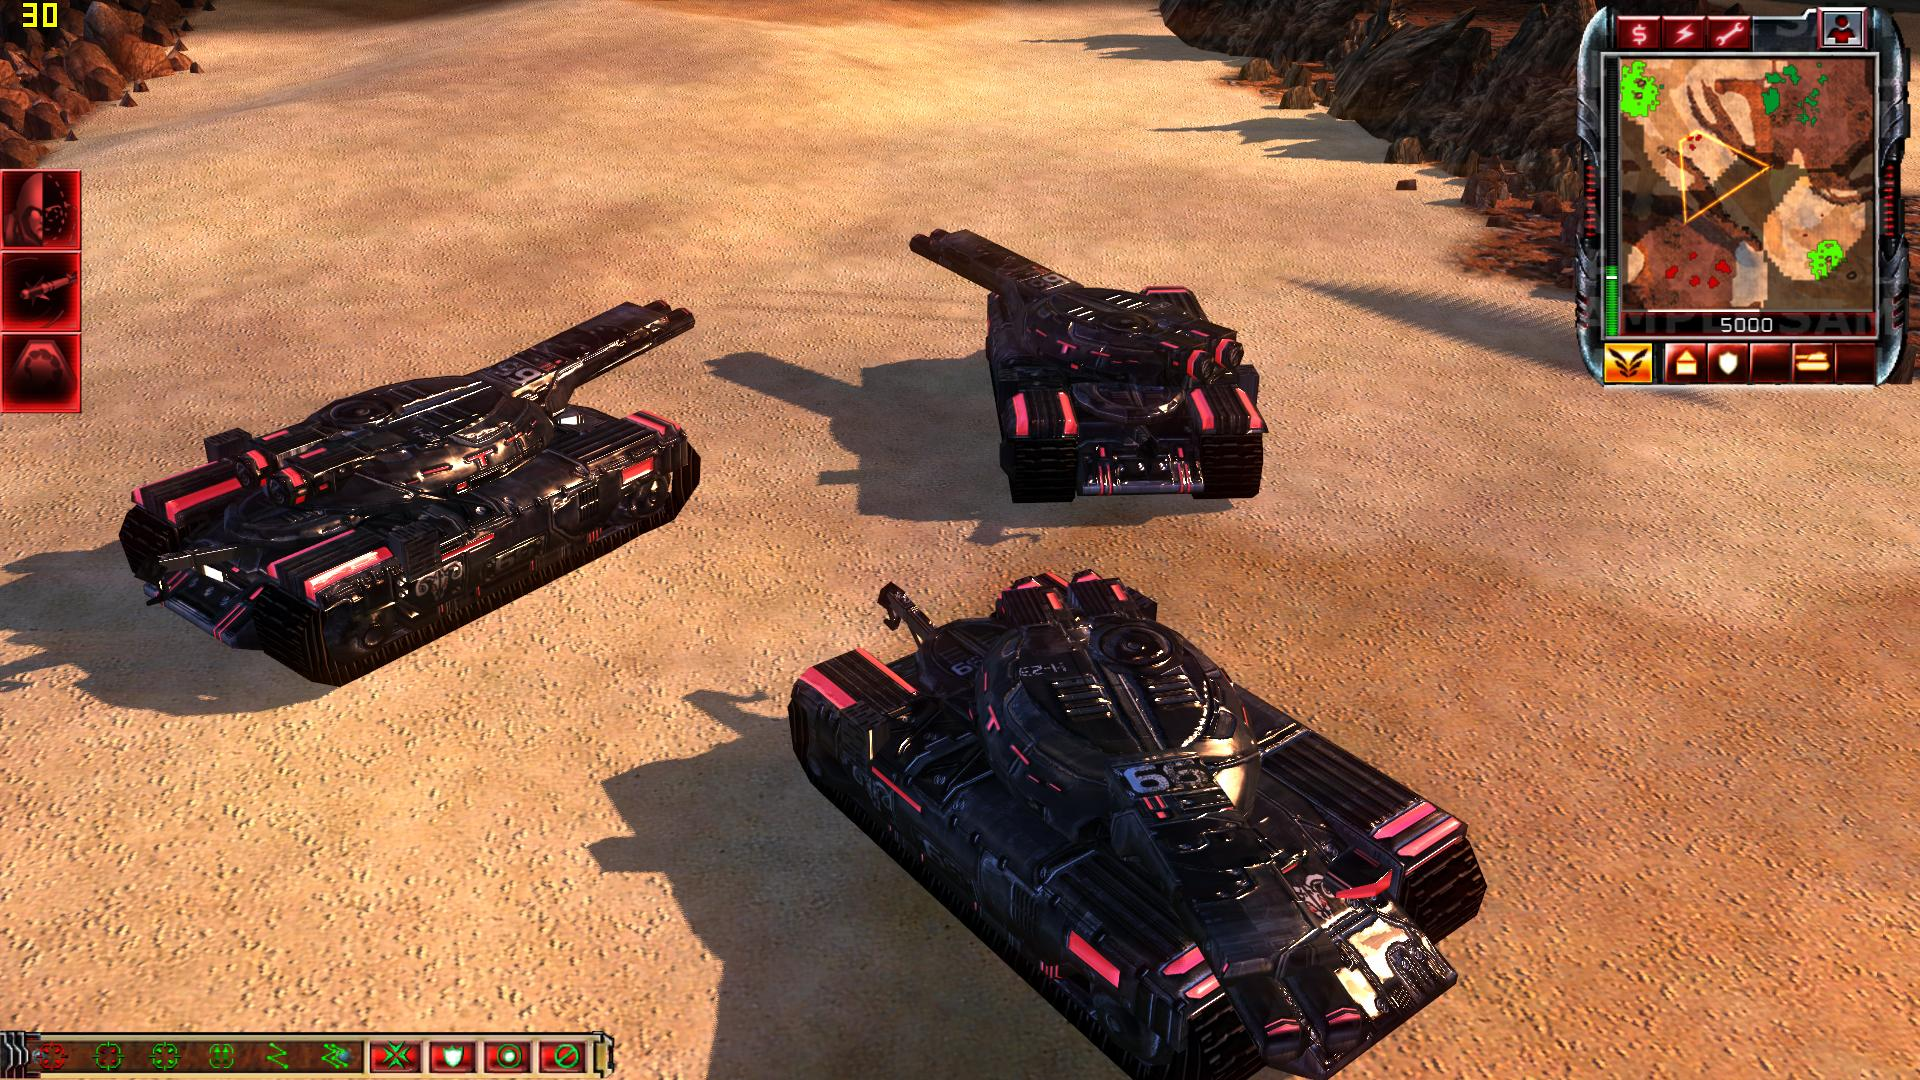 Siege Tank Game Image Dune Mod For C Amp C3 Tiberium Wars